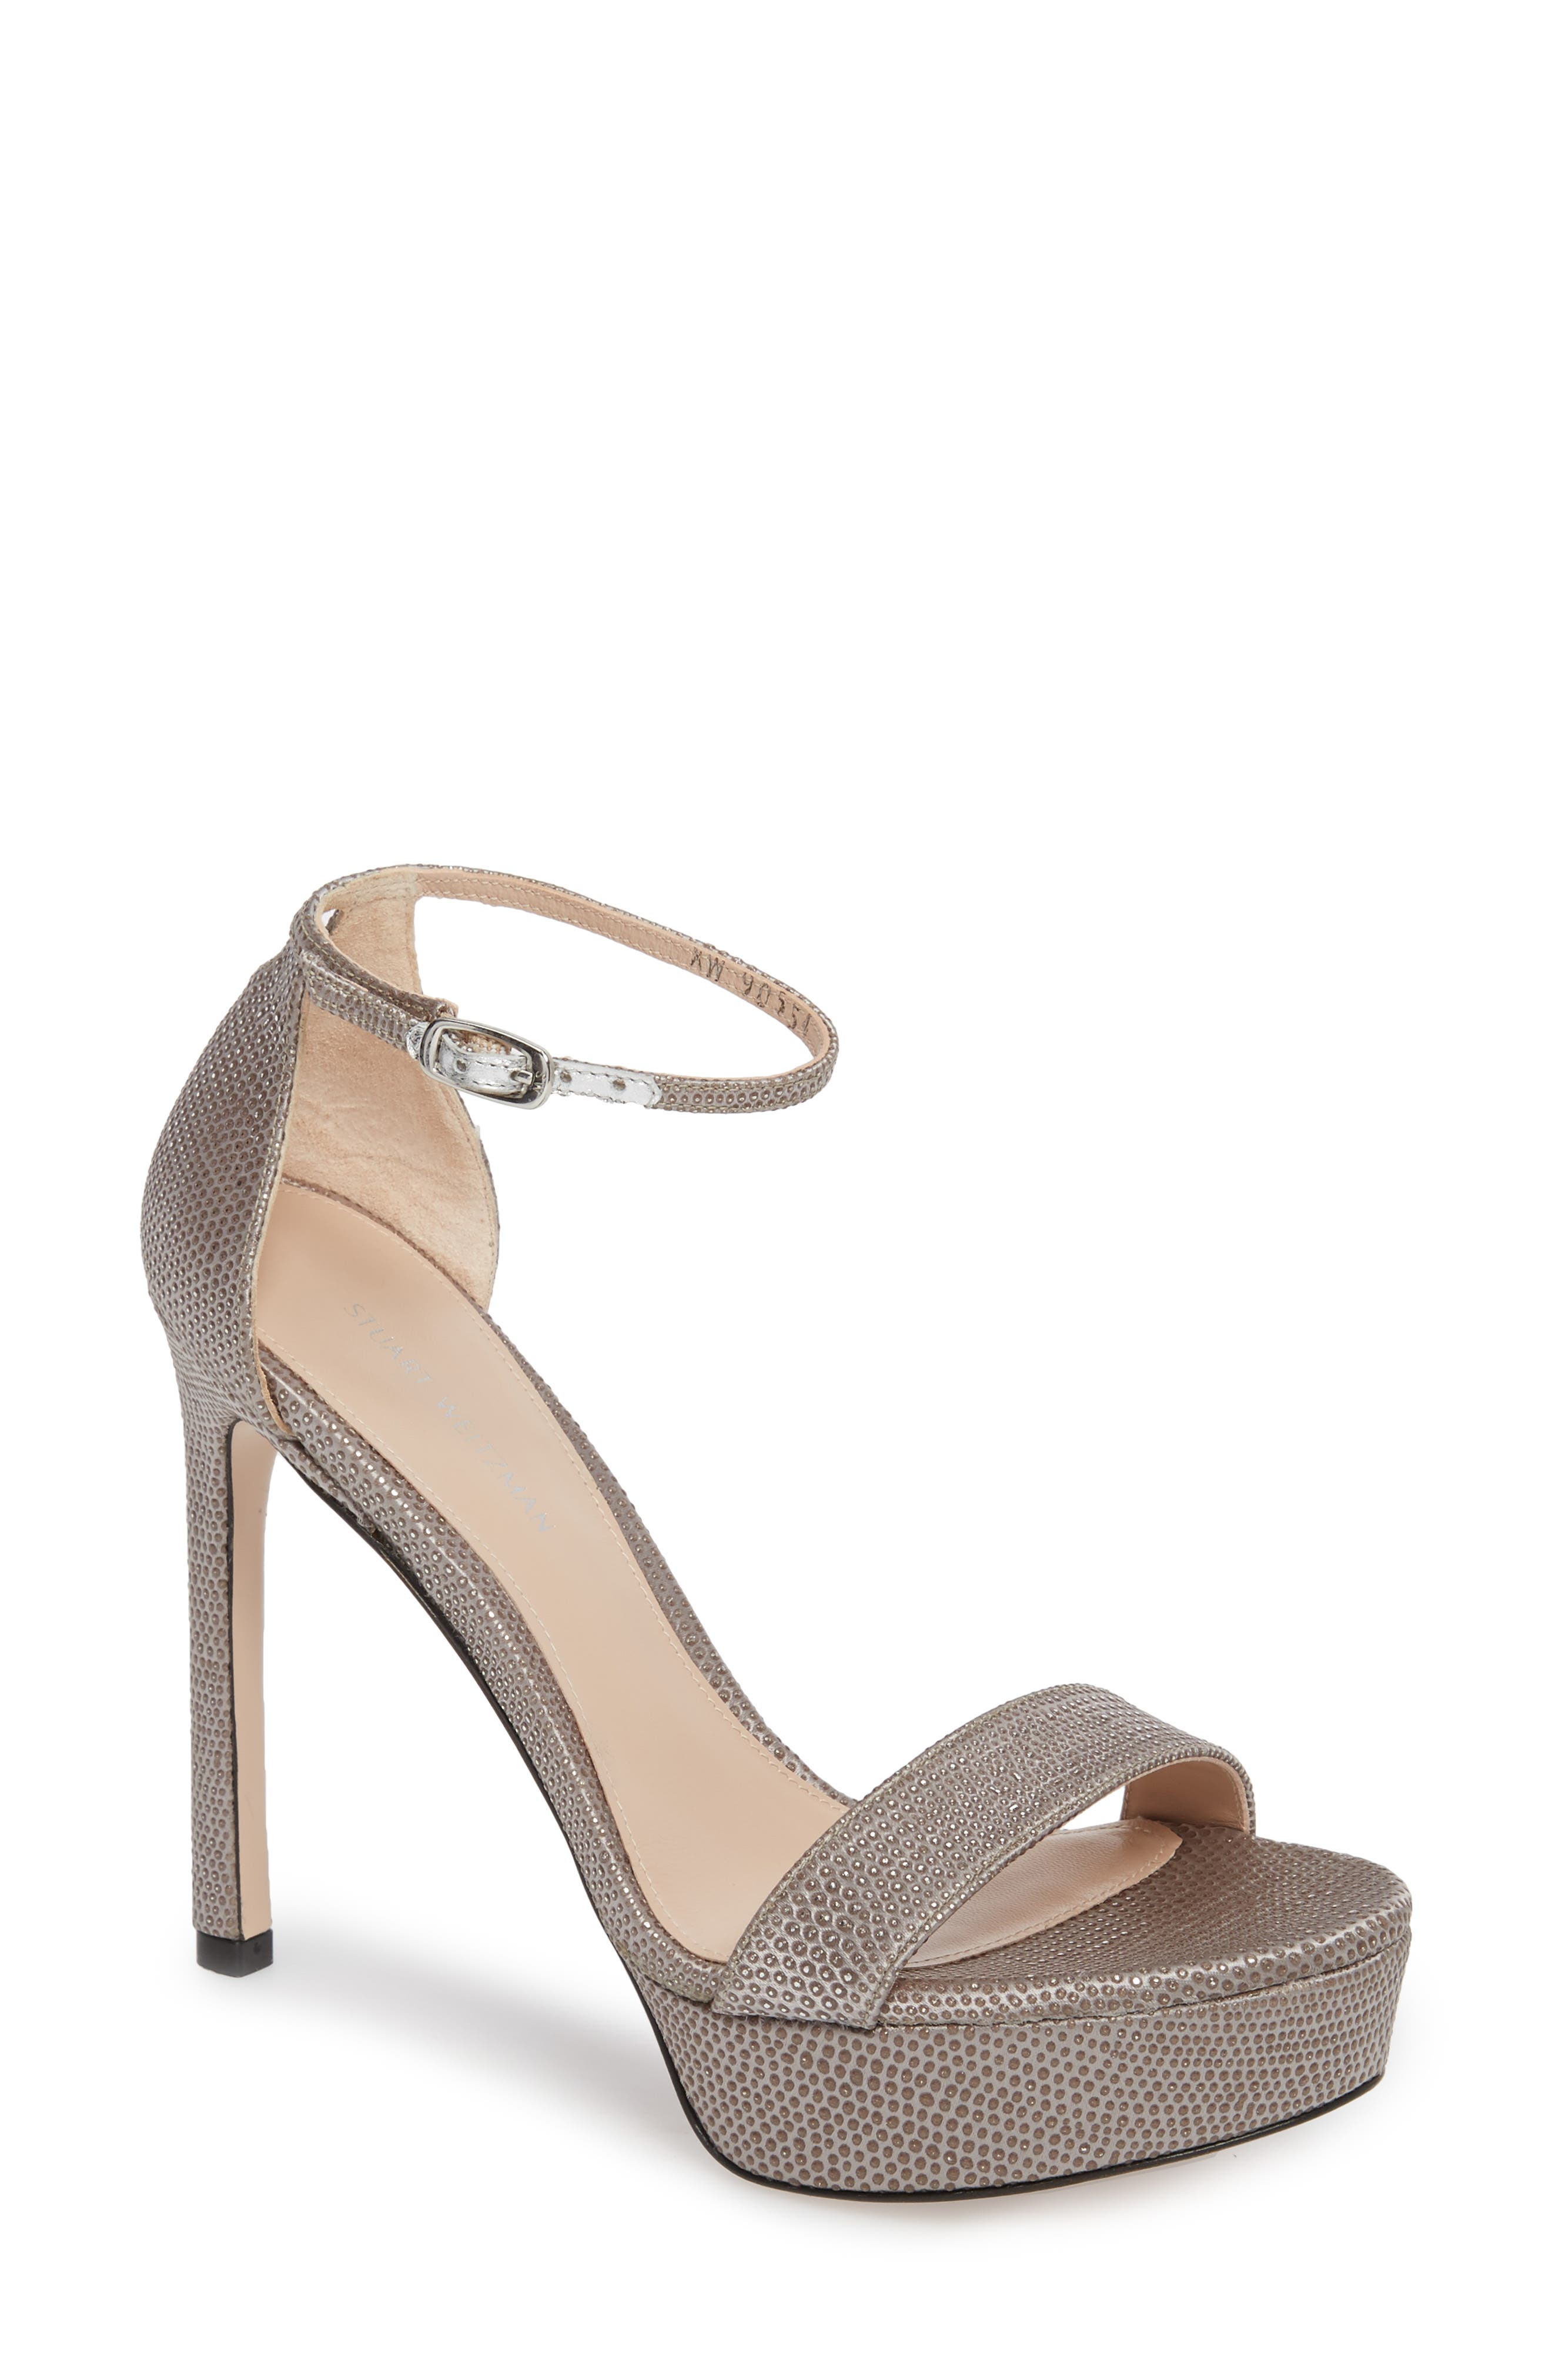 Main Image - Stuart Weitzamn SOHOT Platform Sandal (Women)